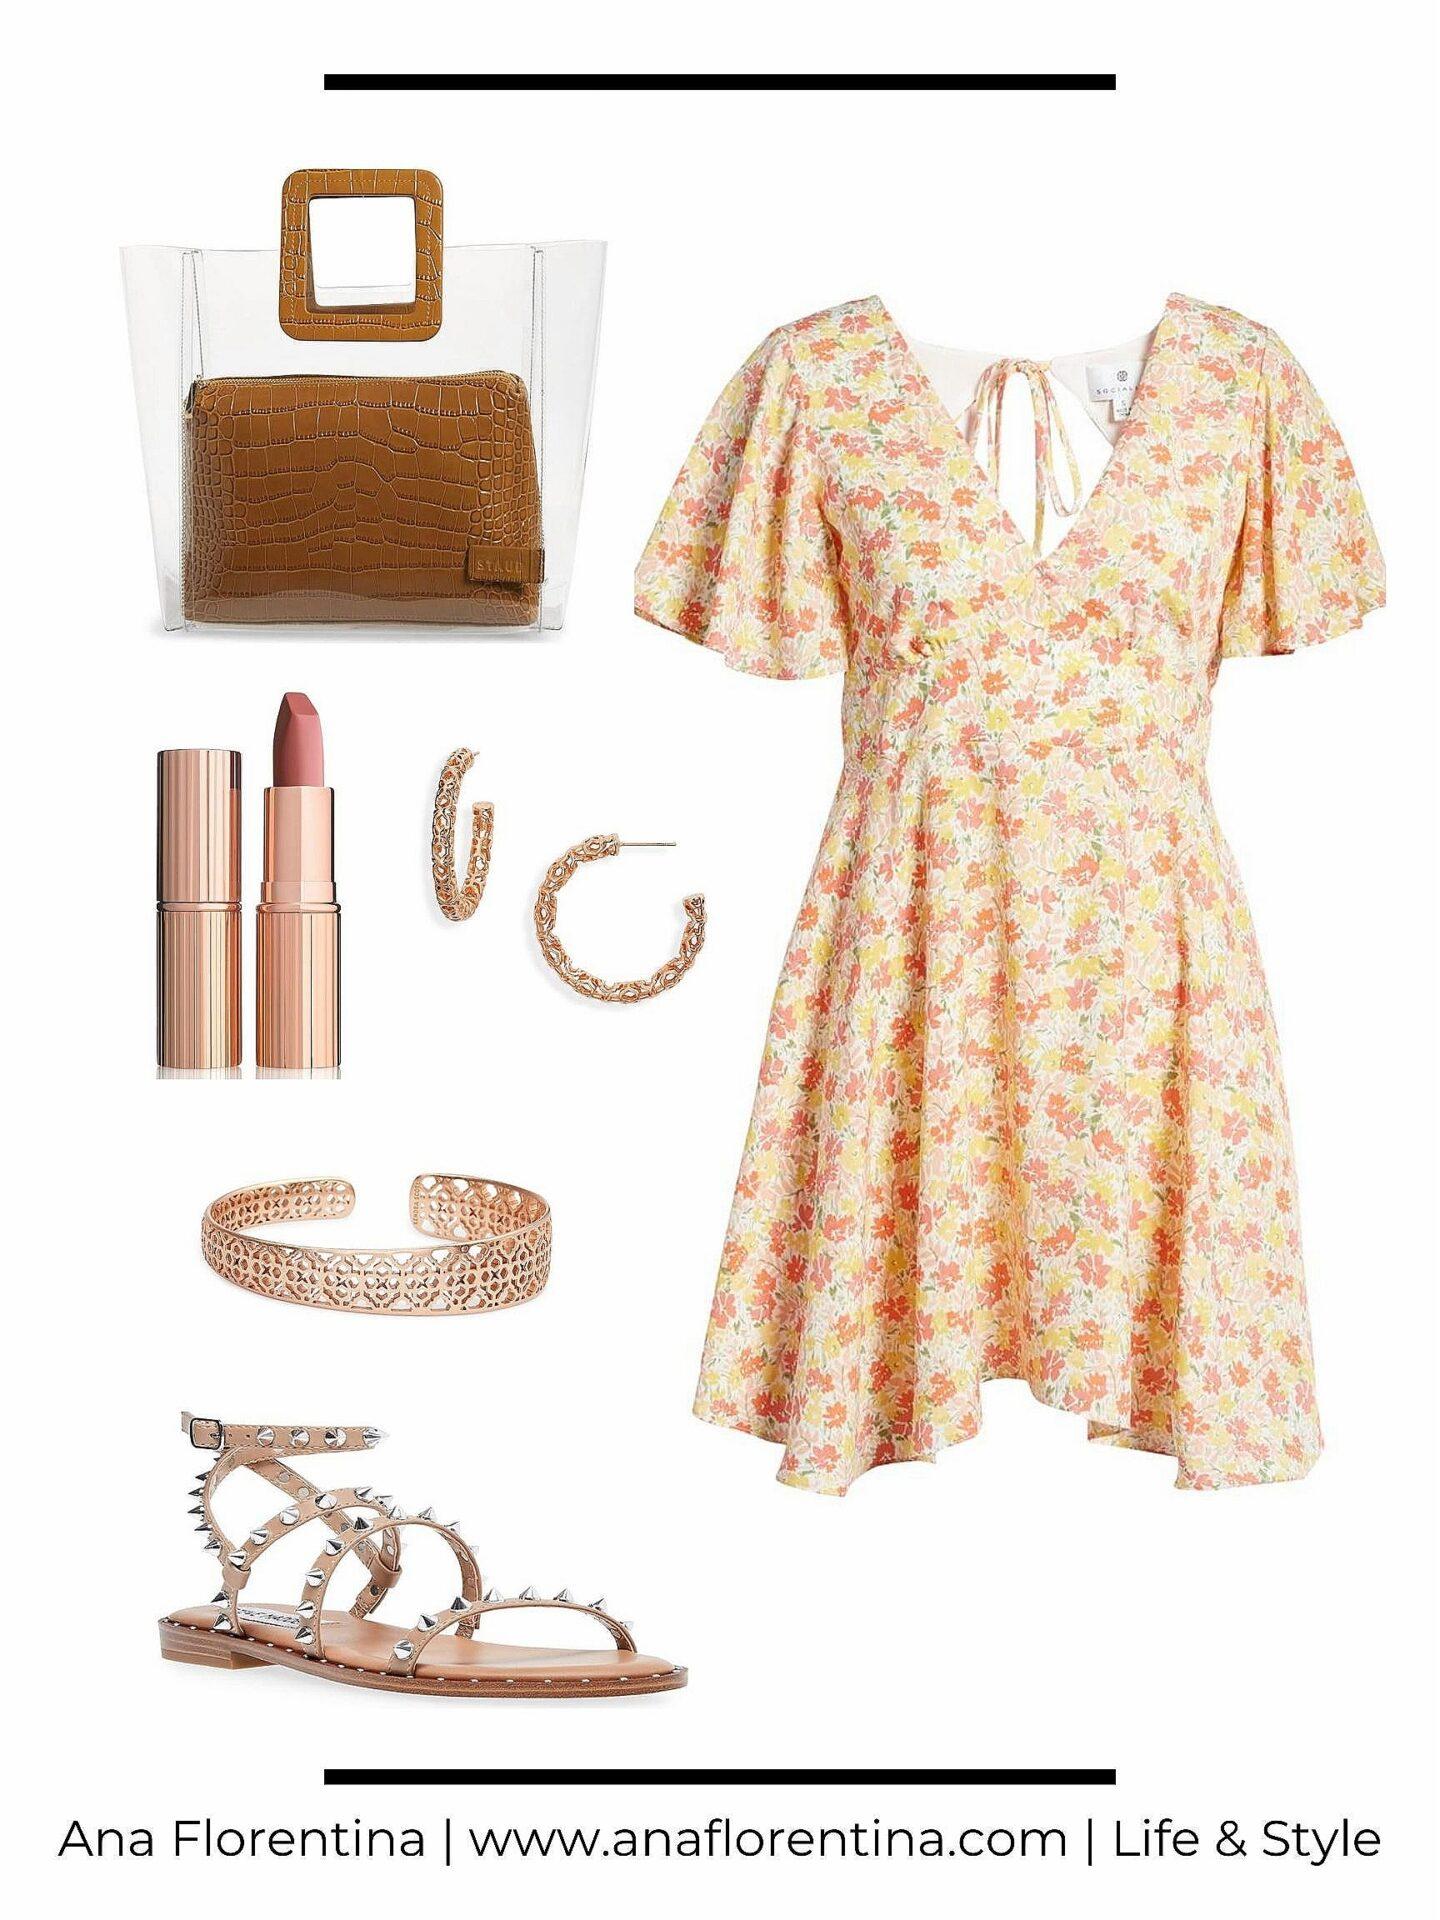 shop-the-look-floral-mini-dress